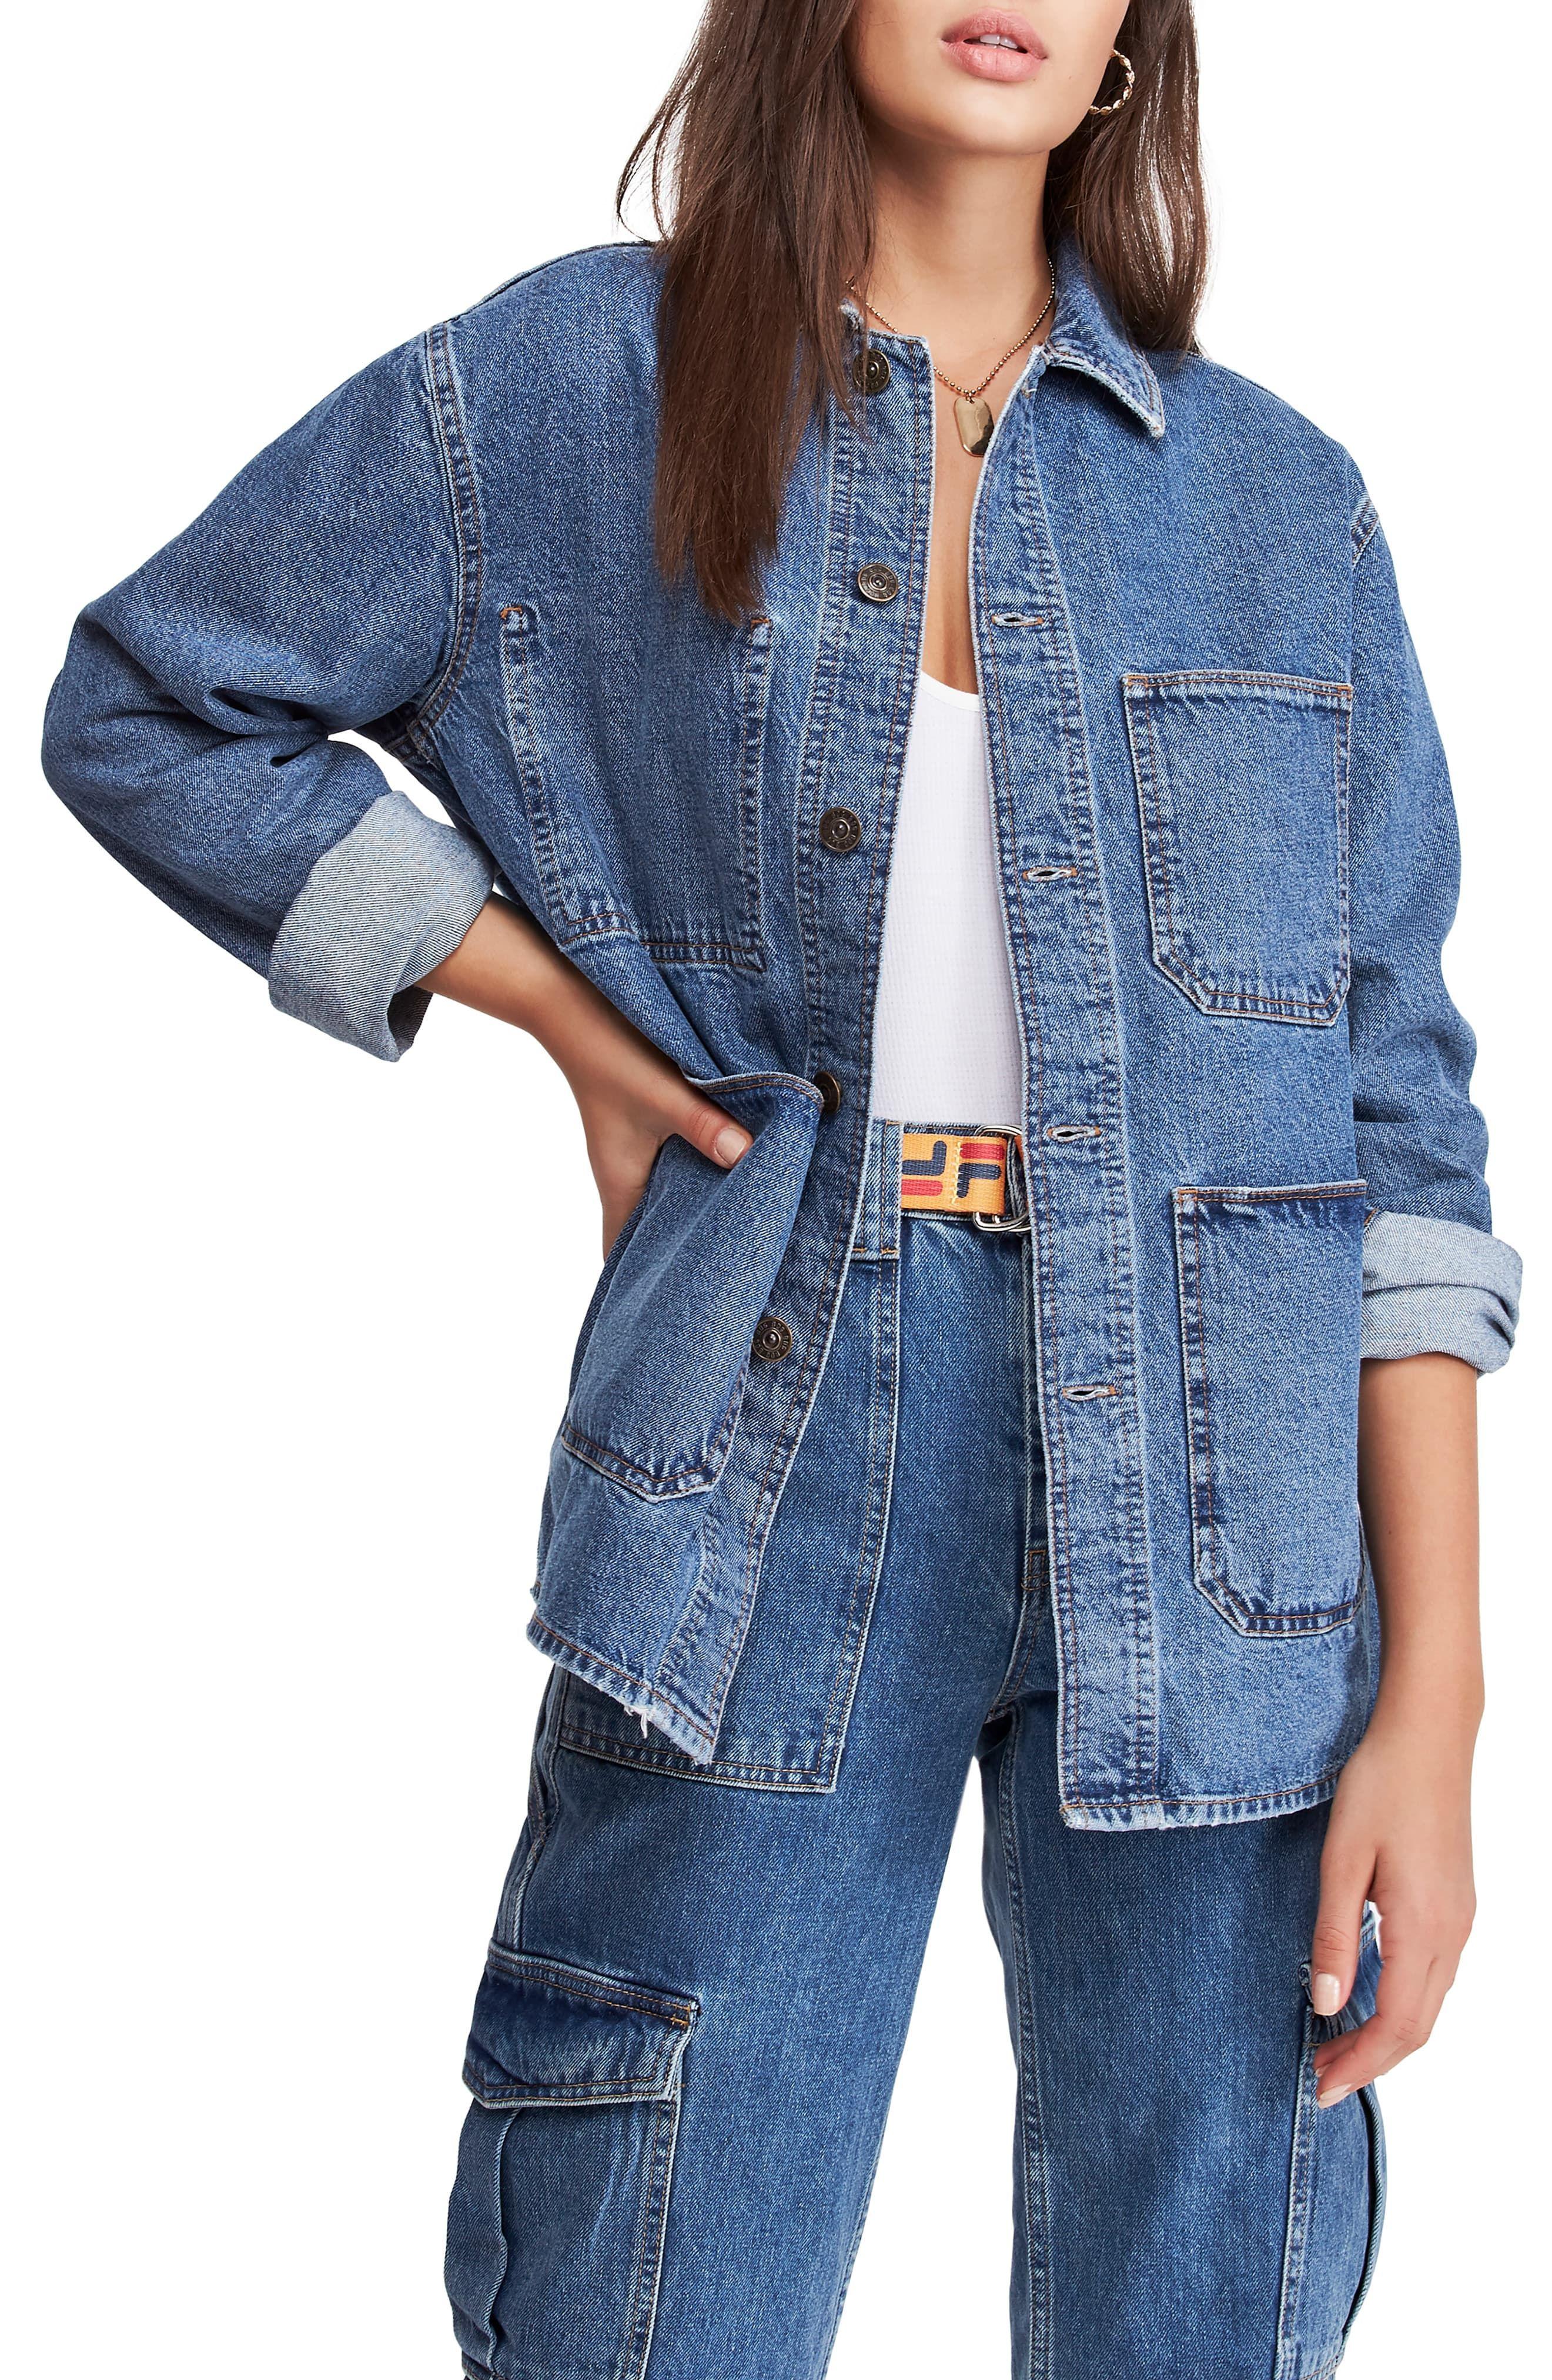 Bdg Urban Outfitters Longline Denim Jacket Nordstrom Denim Jacket Women Longline Denim Jacket Denim Jacket [ 4048 x 2640 Pixel ]